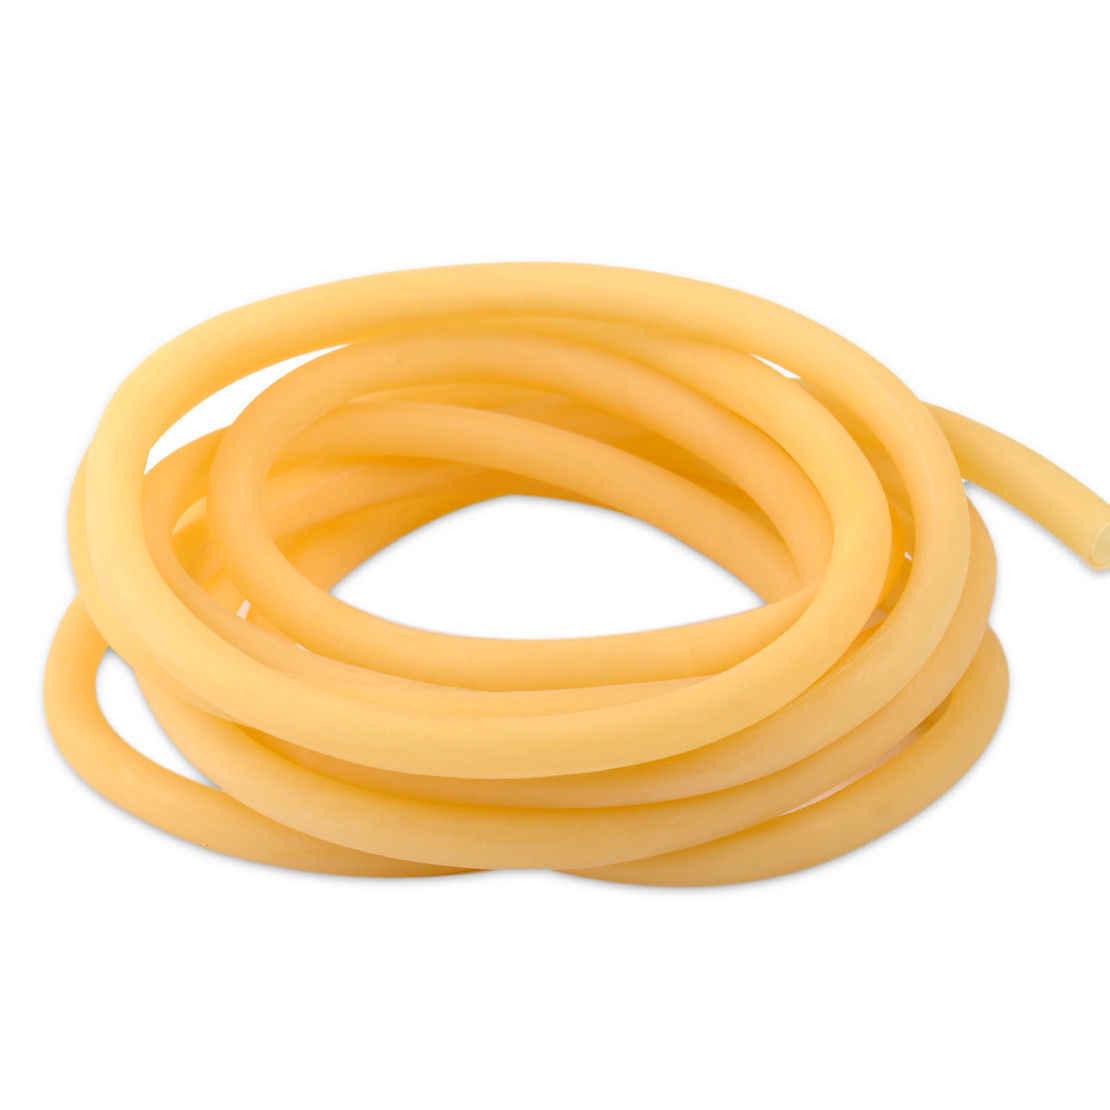 9 mm Fitness Bungee Elastic Rope Fitness Pull Tube zrshygs 3m Tubo de l/átex Natural 6 Amarillo